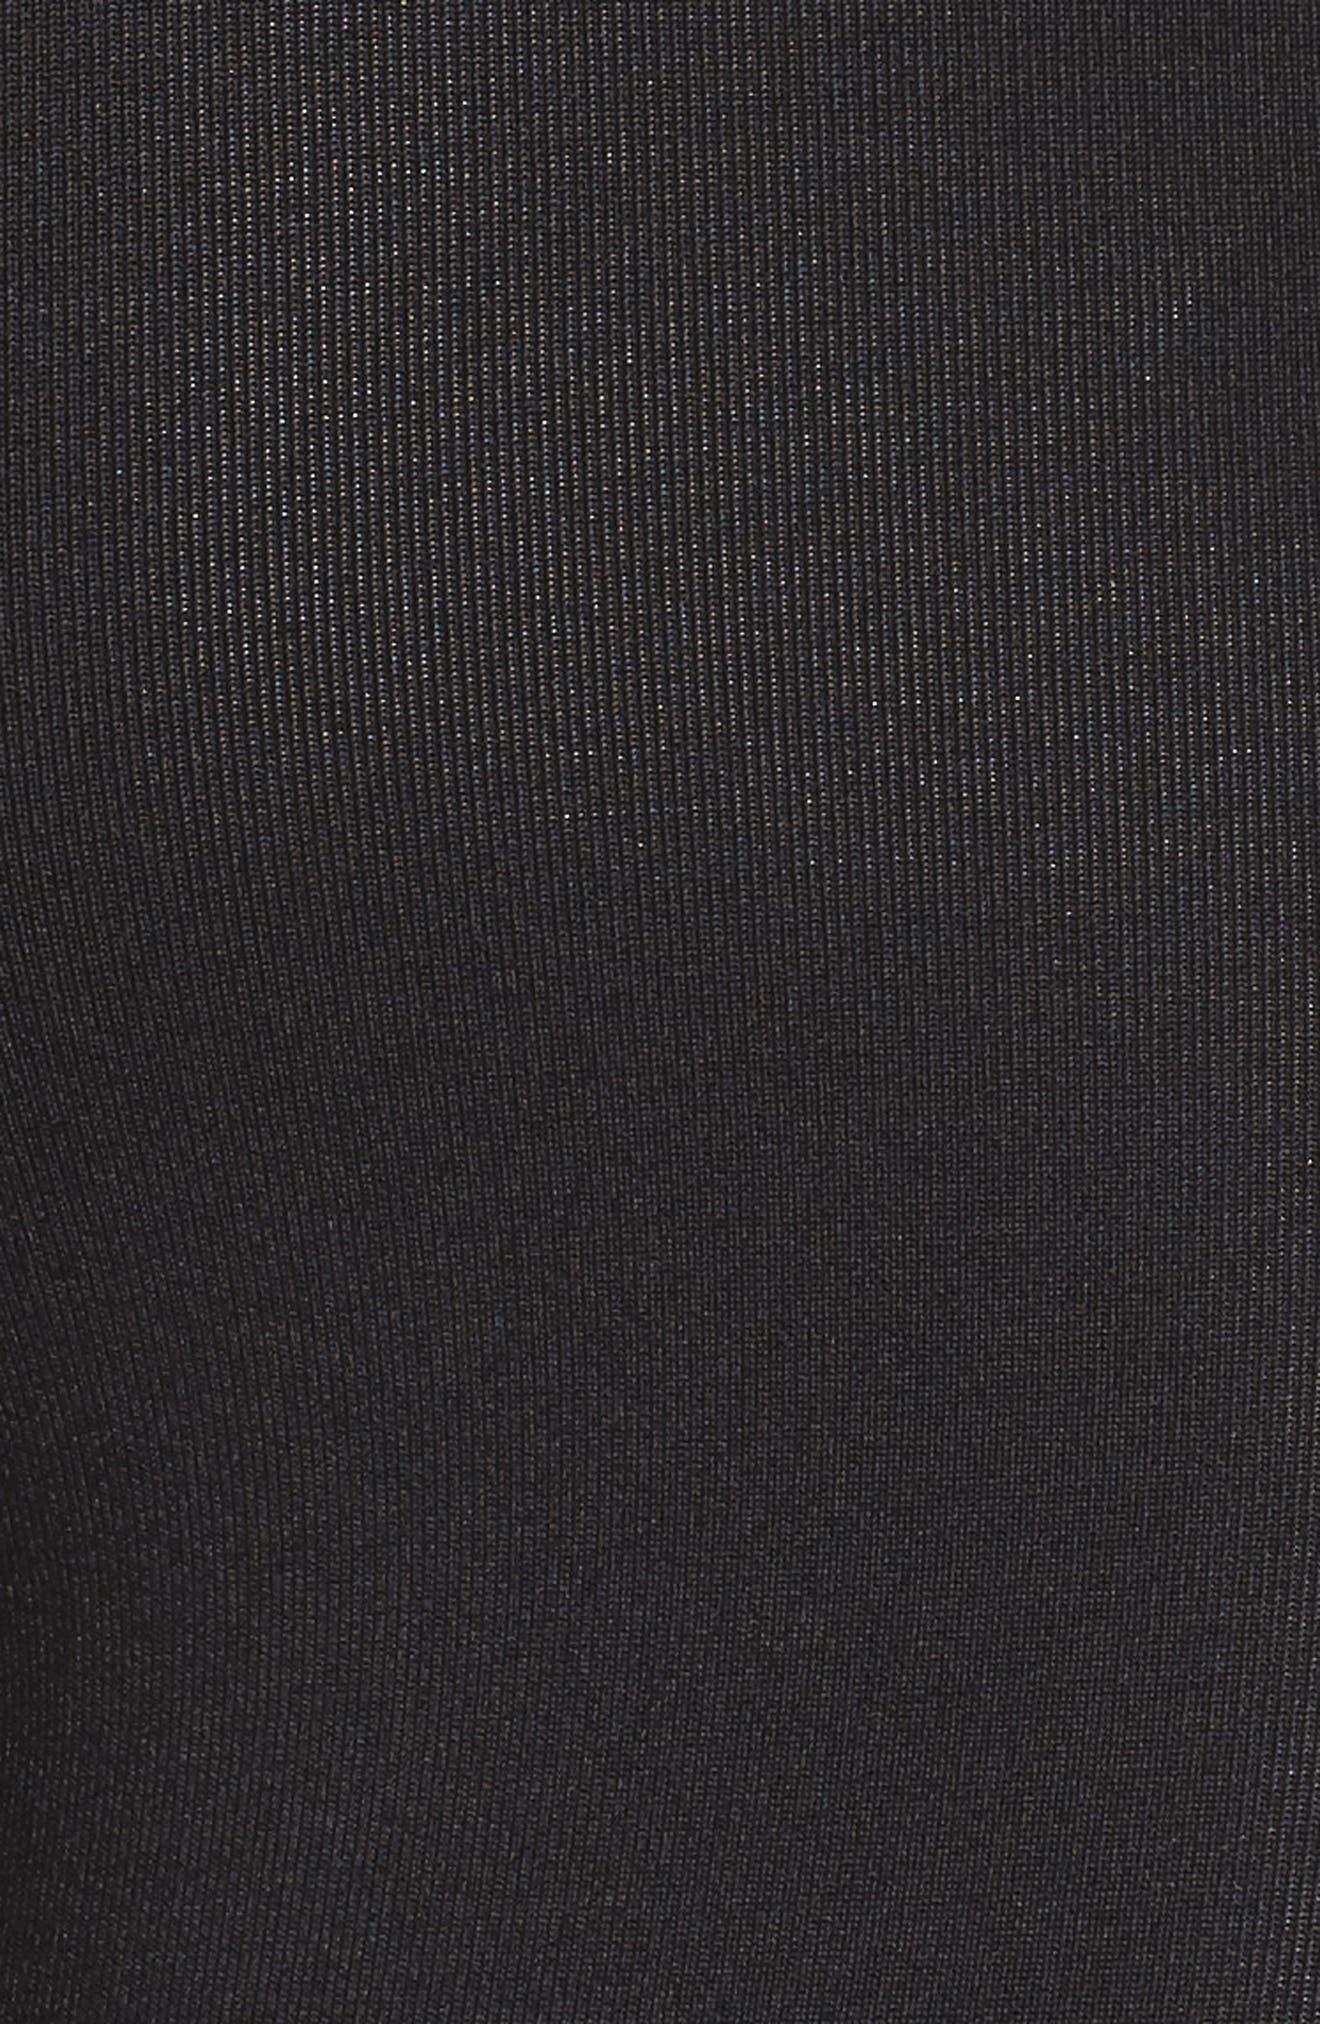 Triumph Leggings,                             Alternate thumbnail 6, color,                             Sapphire Black